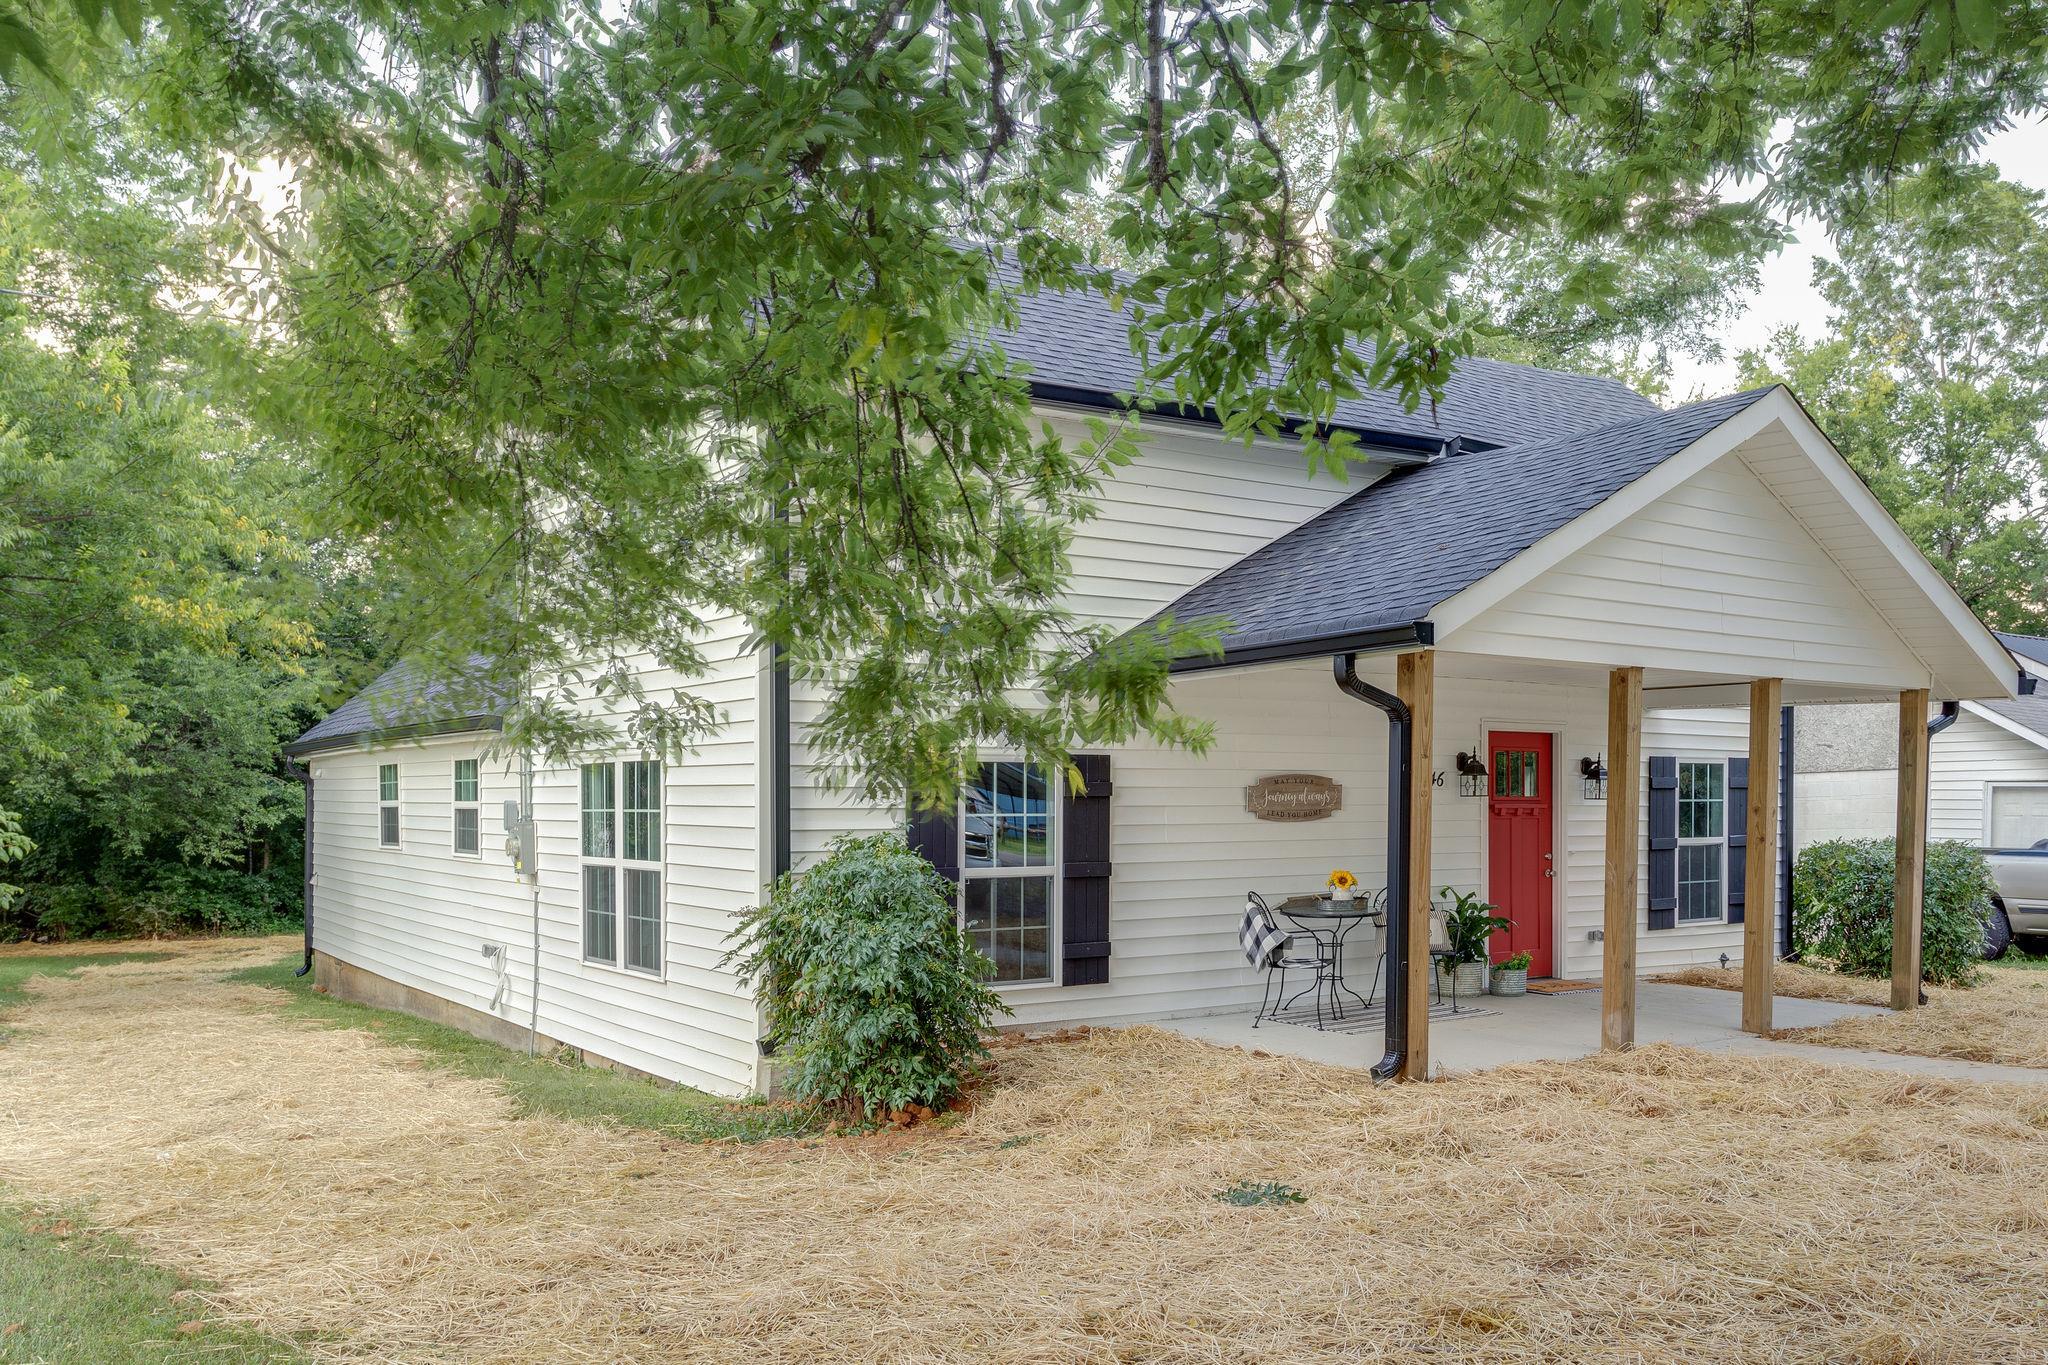 546 Belfast St, Lewisburg, TN 37091 - Lewisburg, TN real estate listing